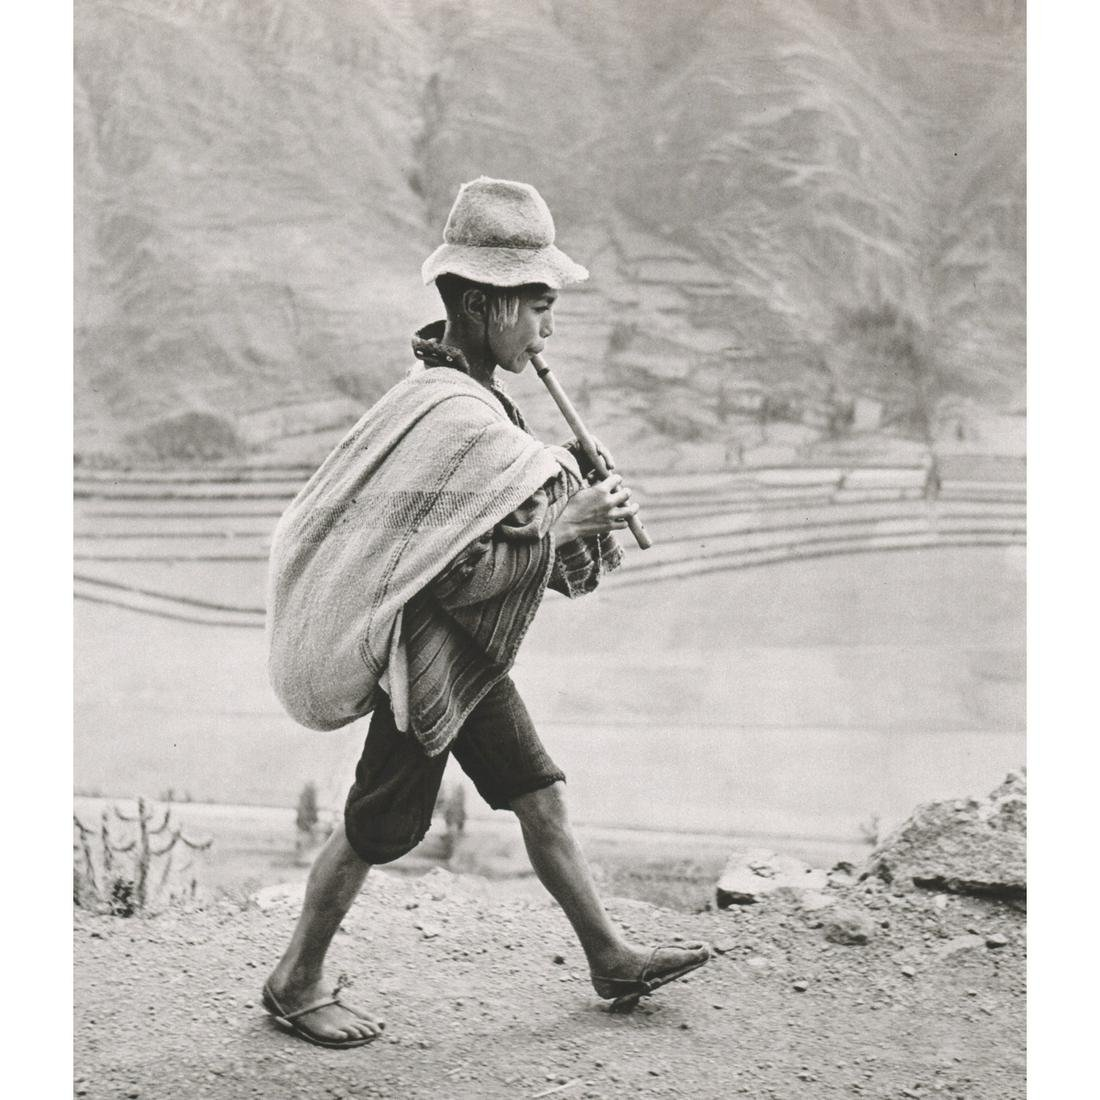 WERNER BISCHOF - Flute Player on his way to Cuzco